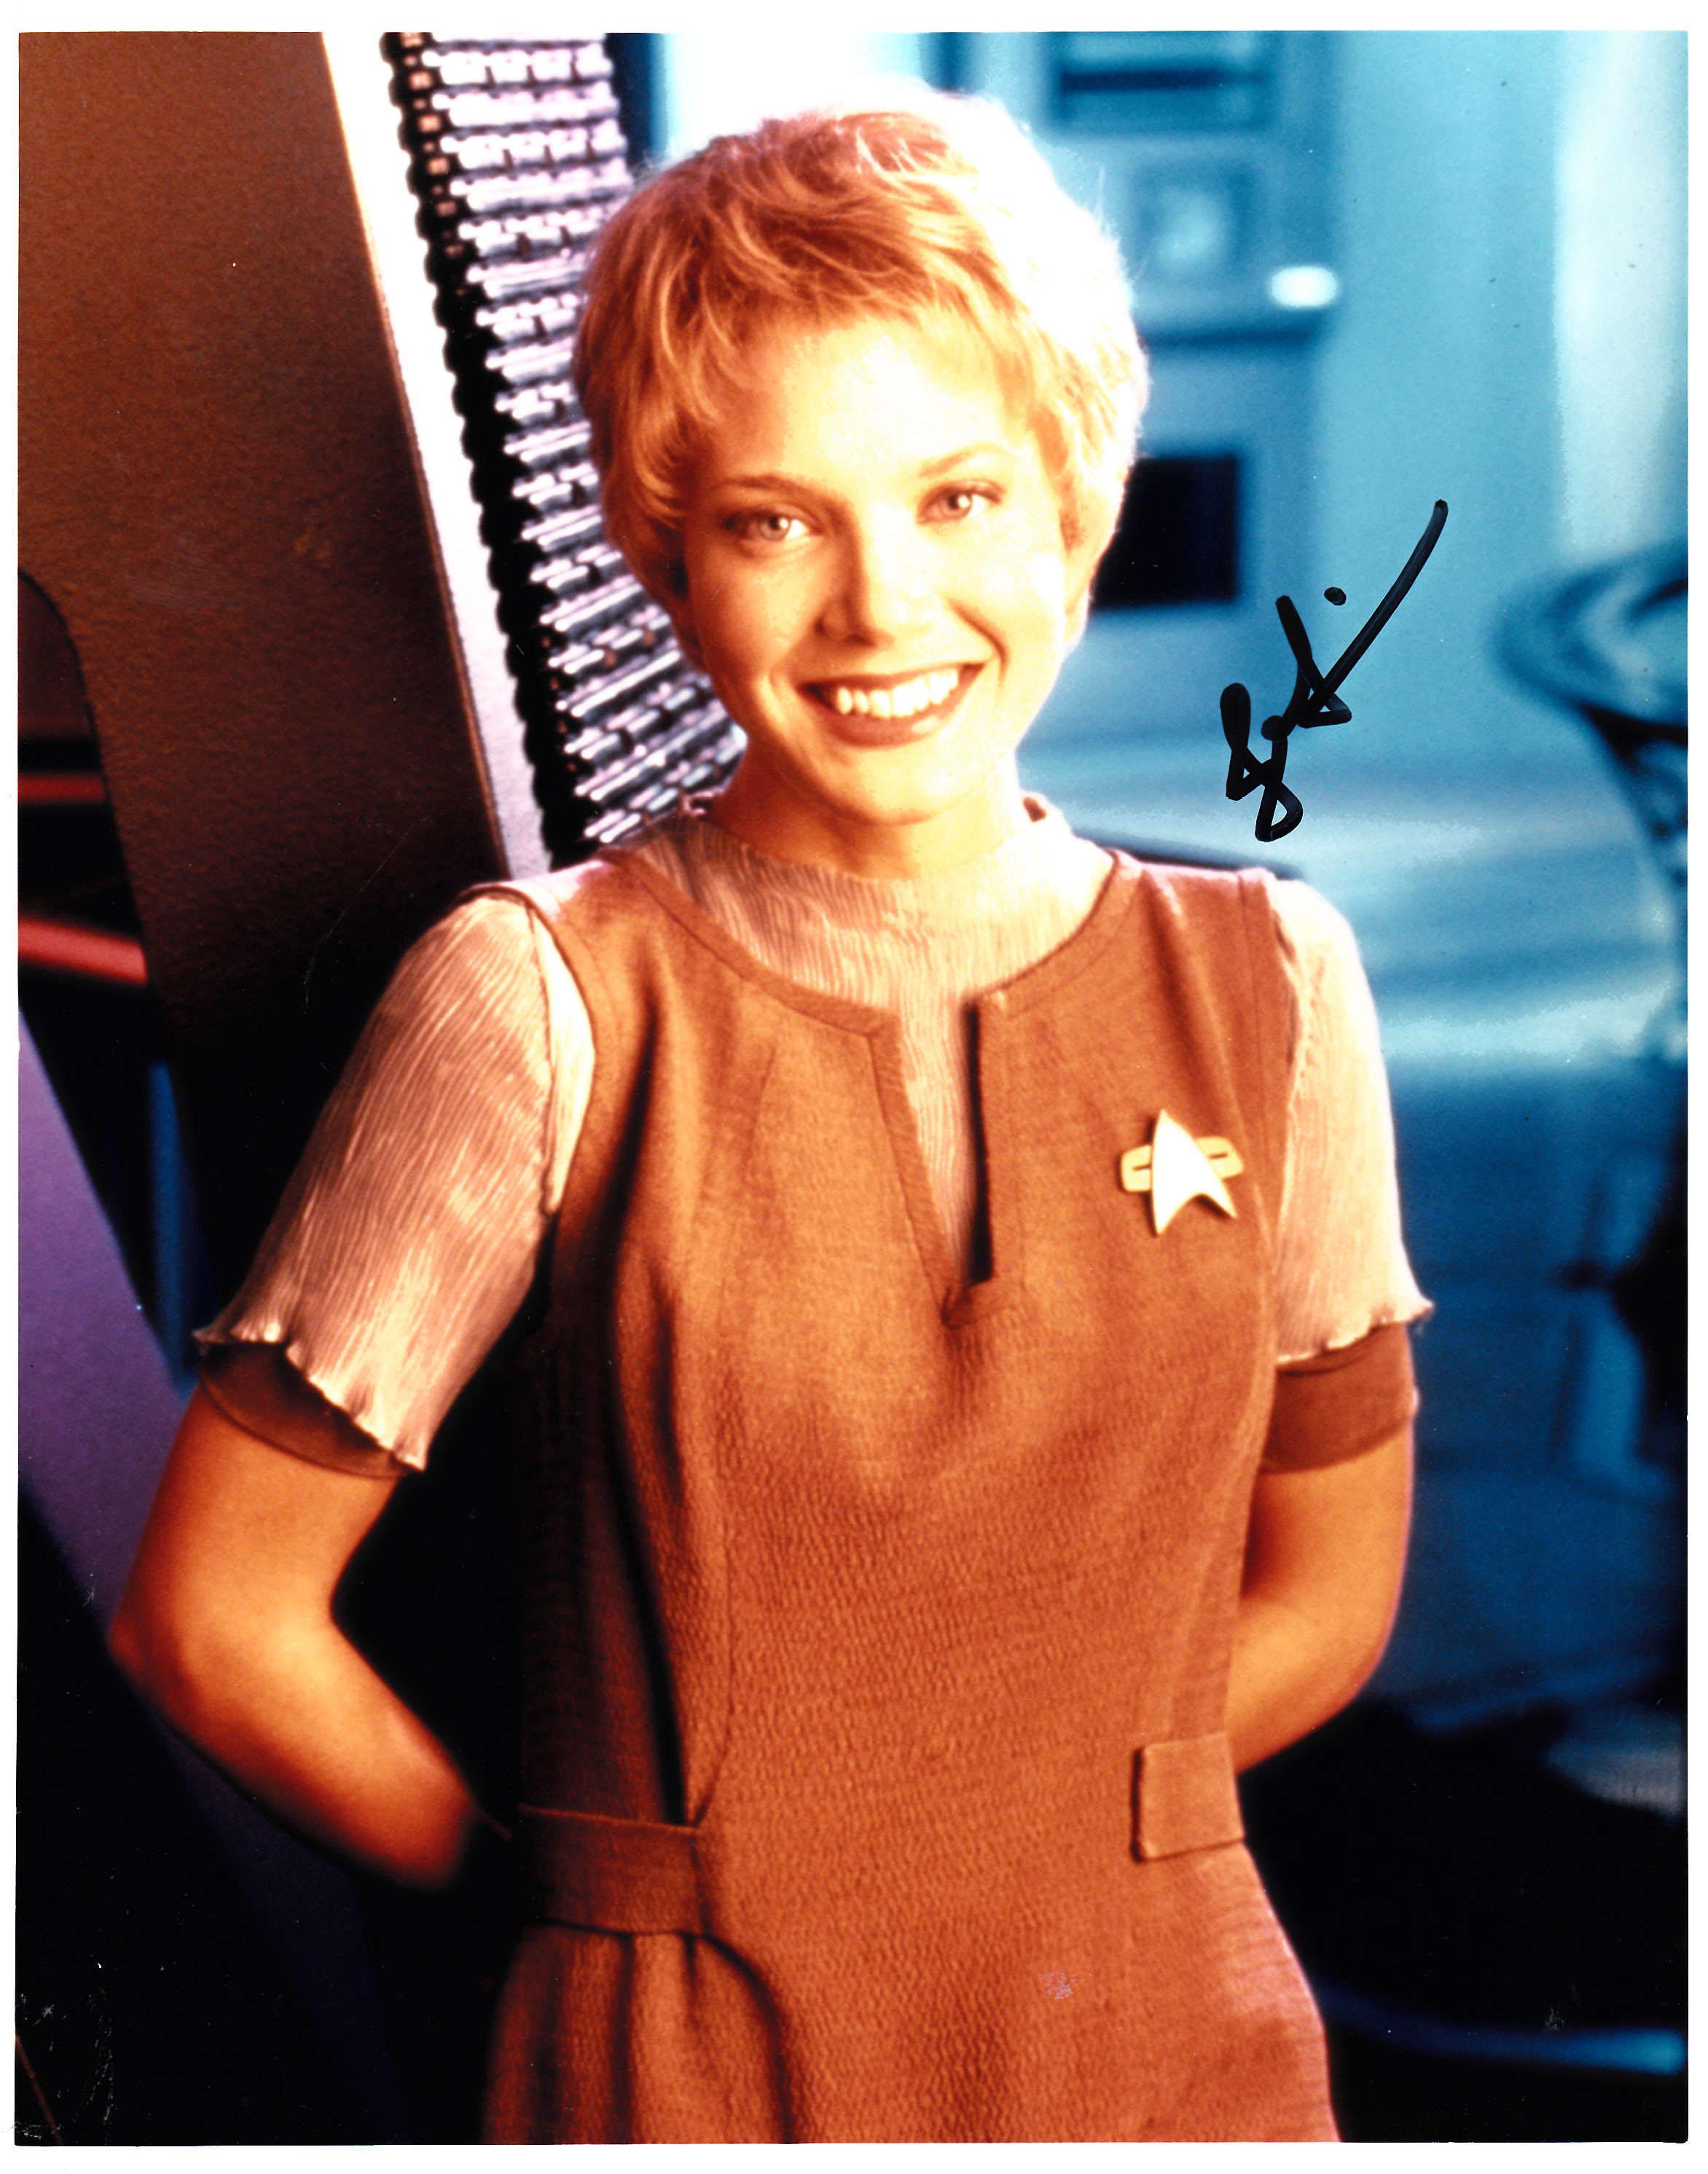 Jennifer Lien Star Trek Voyager signed 8x10 photo - Fanboy